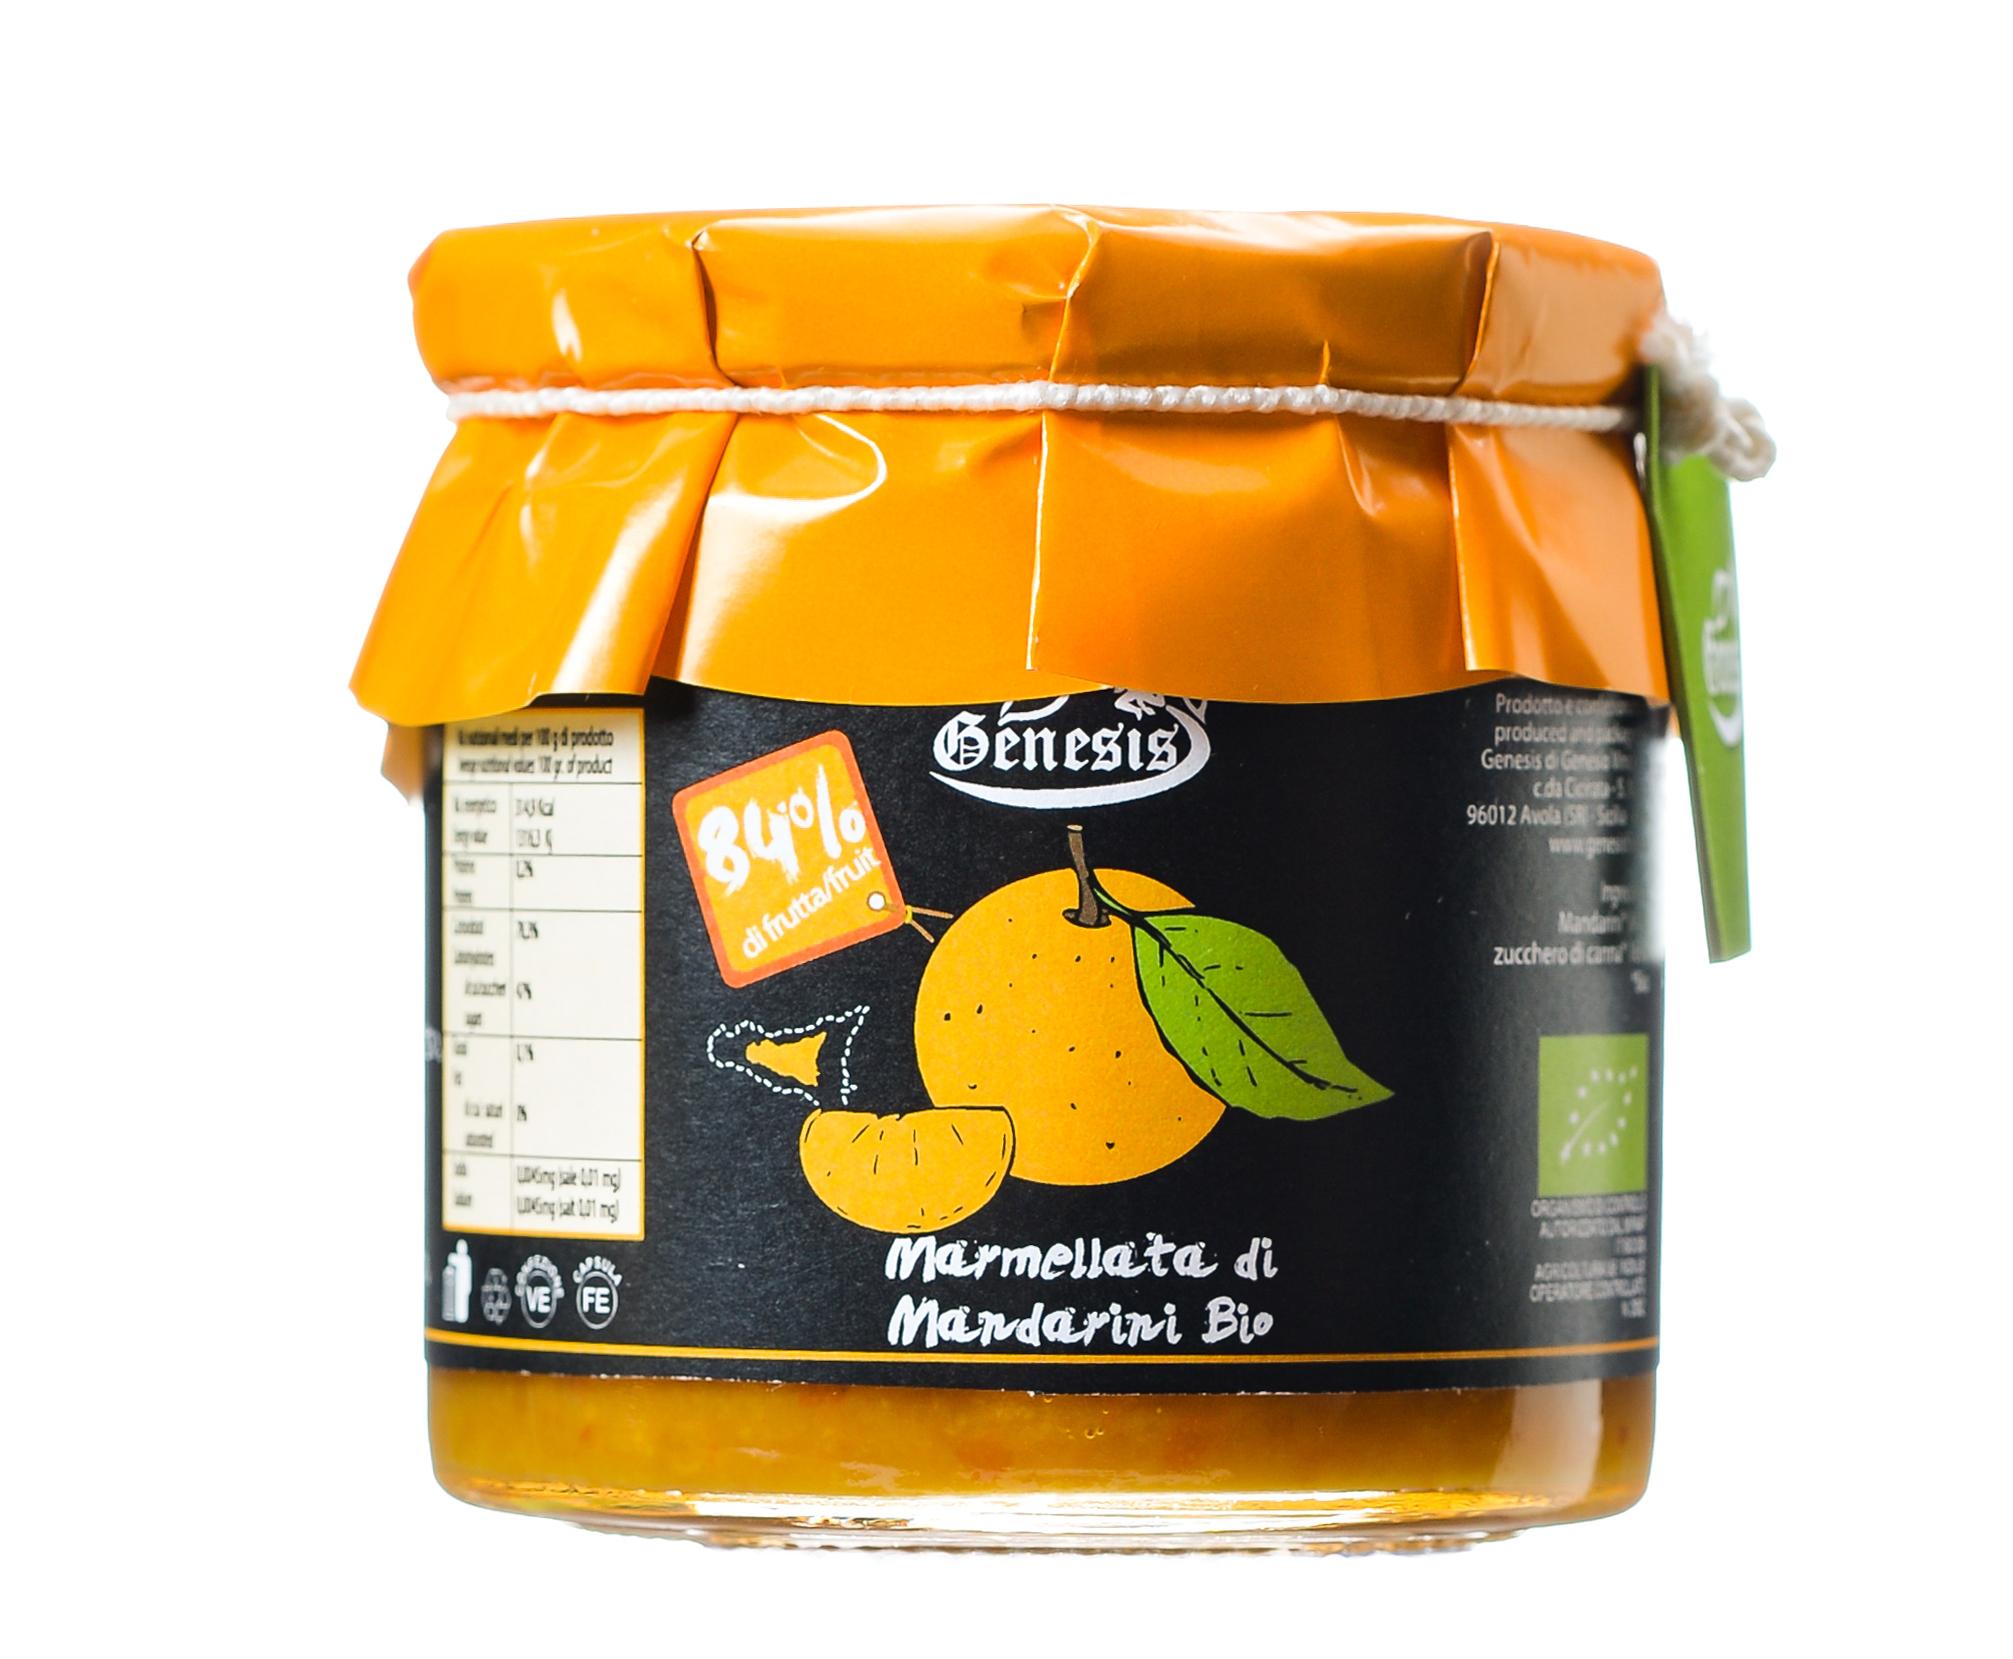 Marmellata di mandarini Bio マンダリンオレンジジャム